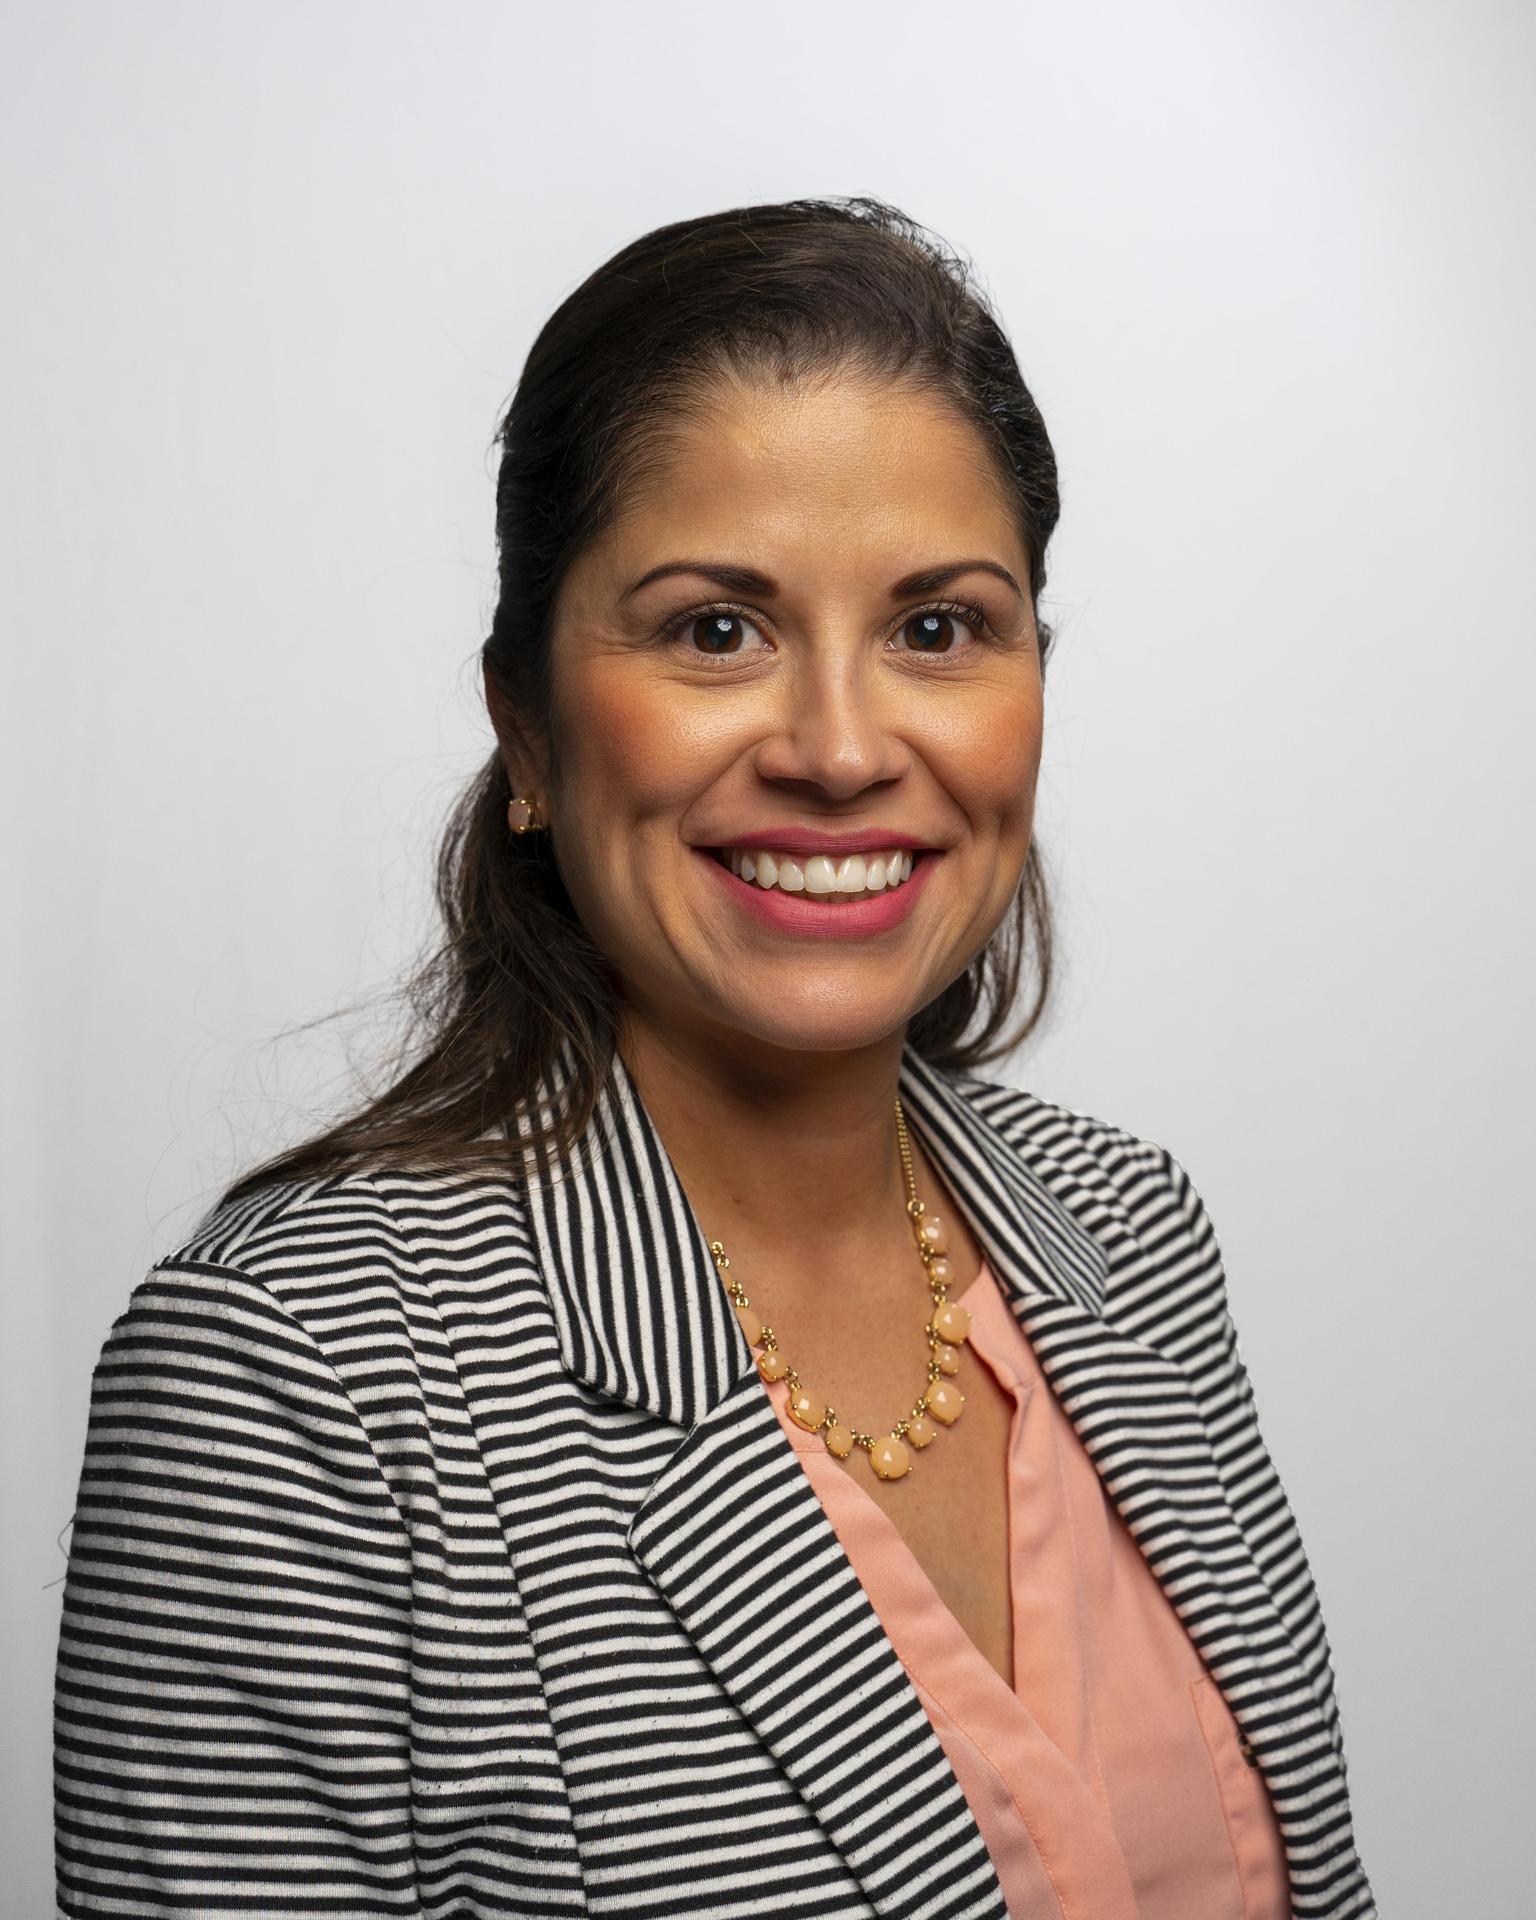 Jenny Gomez Music Teacher Potranco Elementary